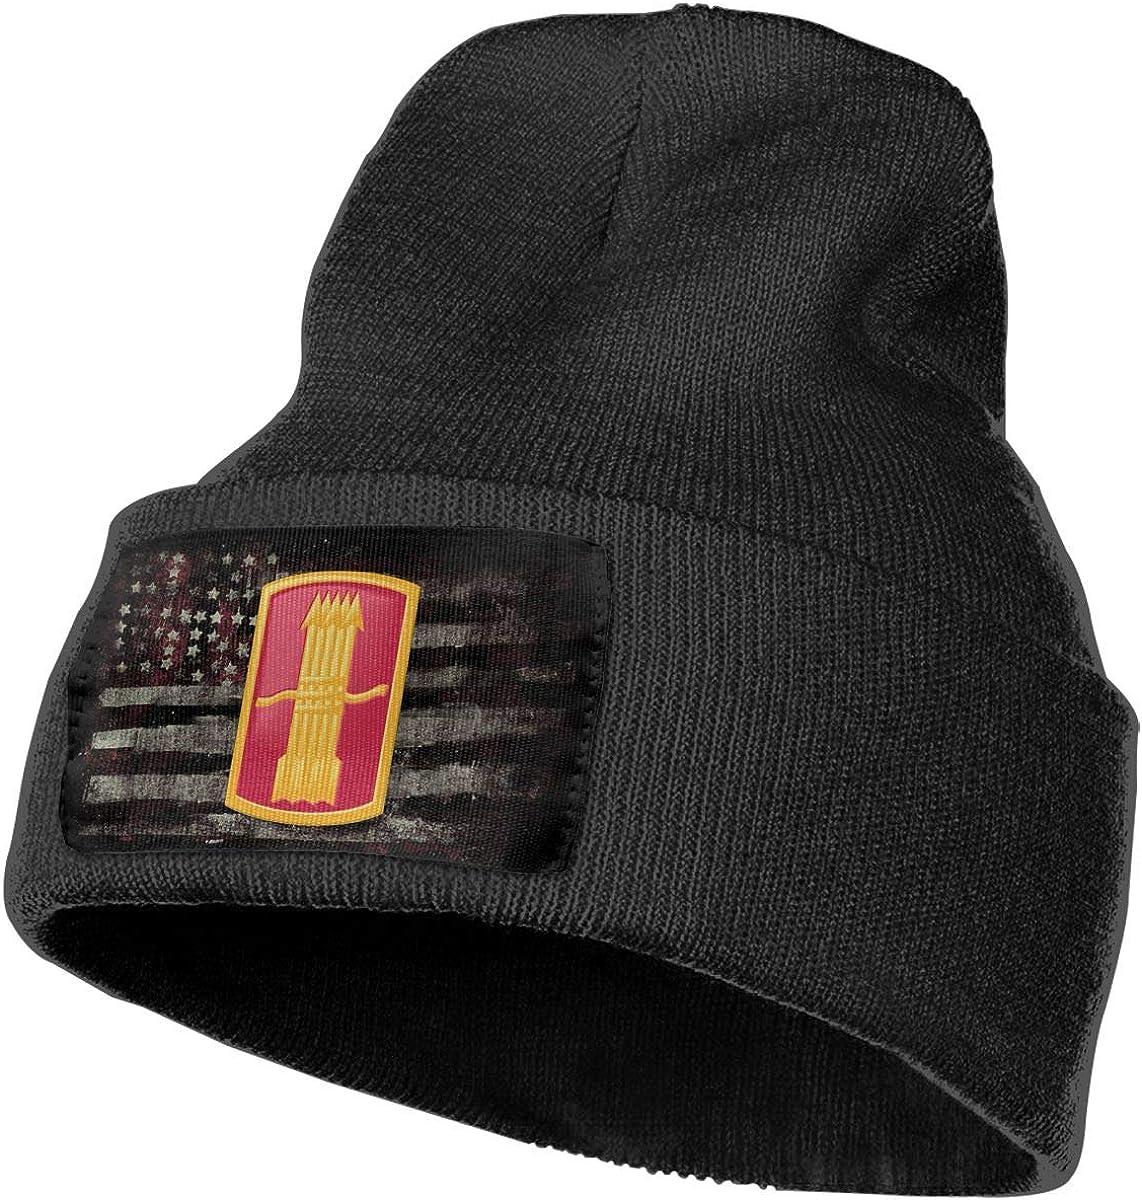 FORDSAN CP Army 197th Field Artillery Brigade New Hampshire Mens Beanie Cap Skull Cap Winter Warm Knitting Hats.